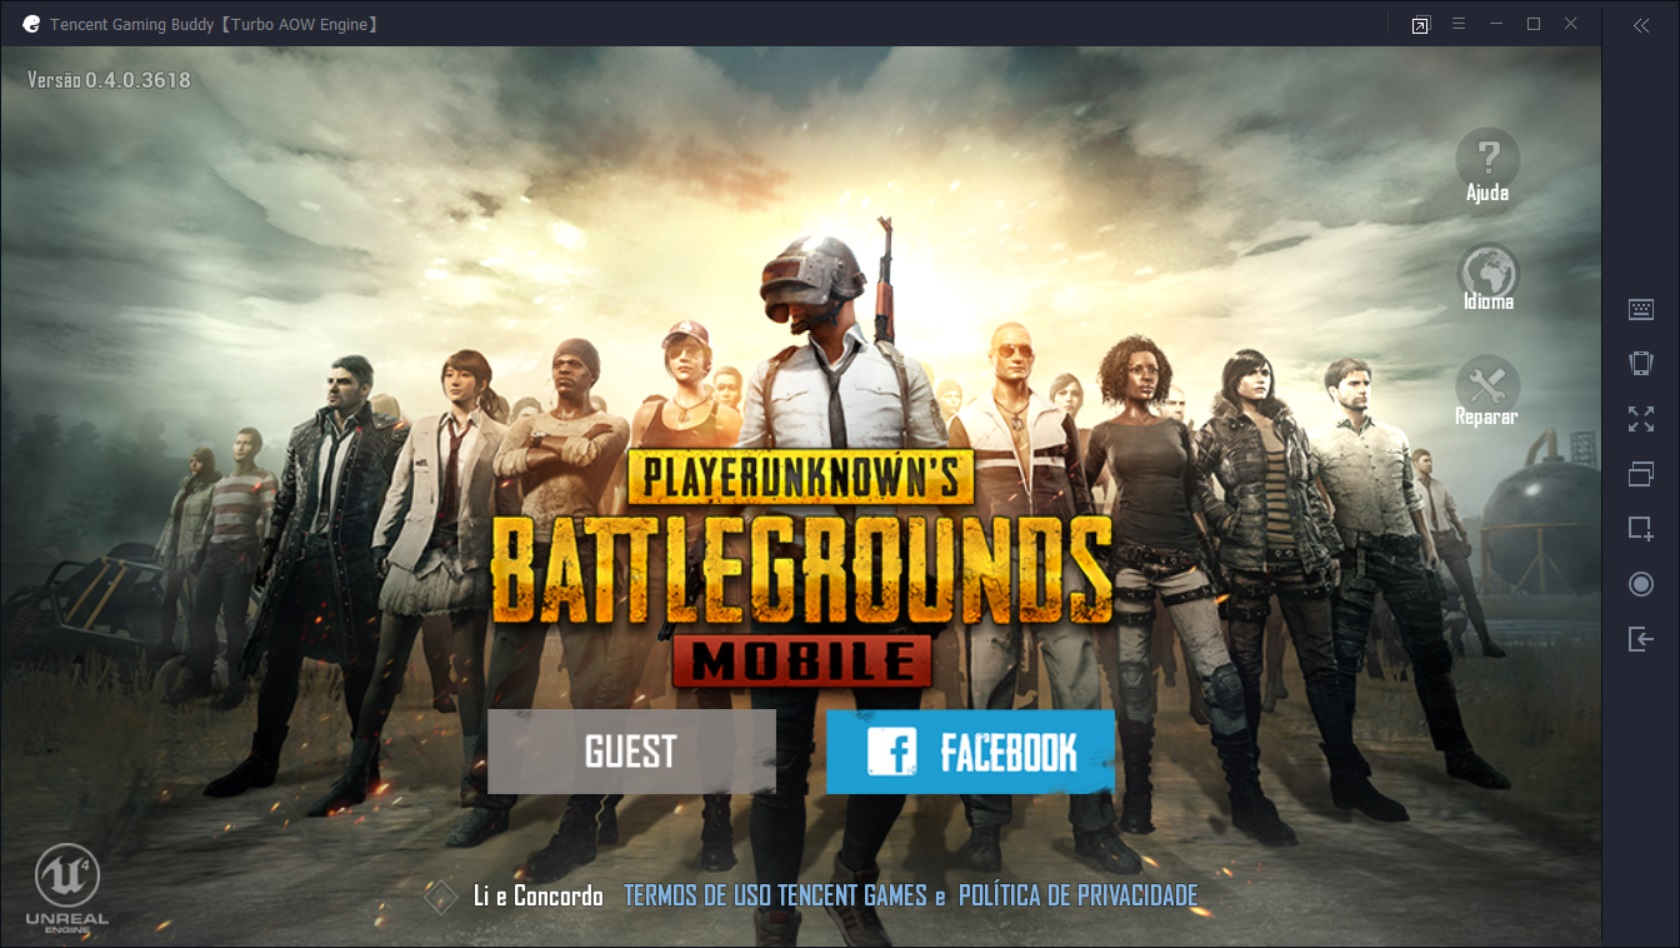 download jogos pc gratis completo portugues